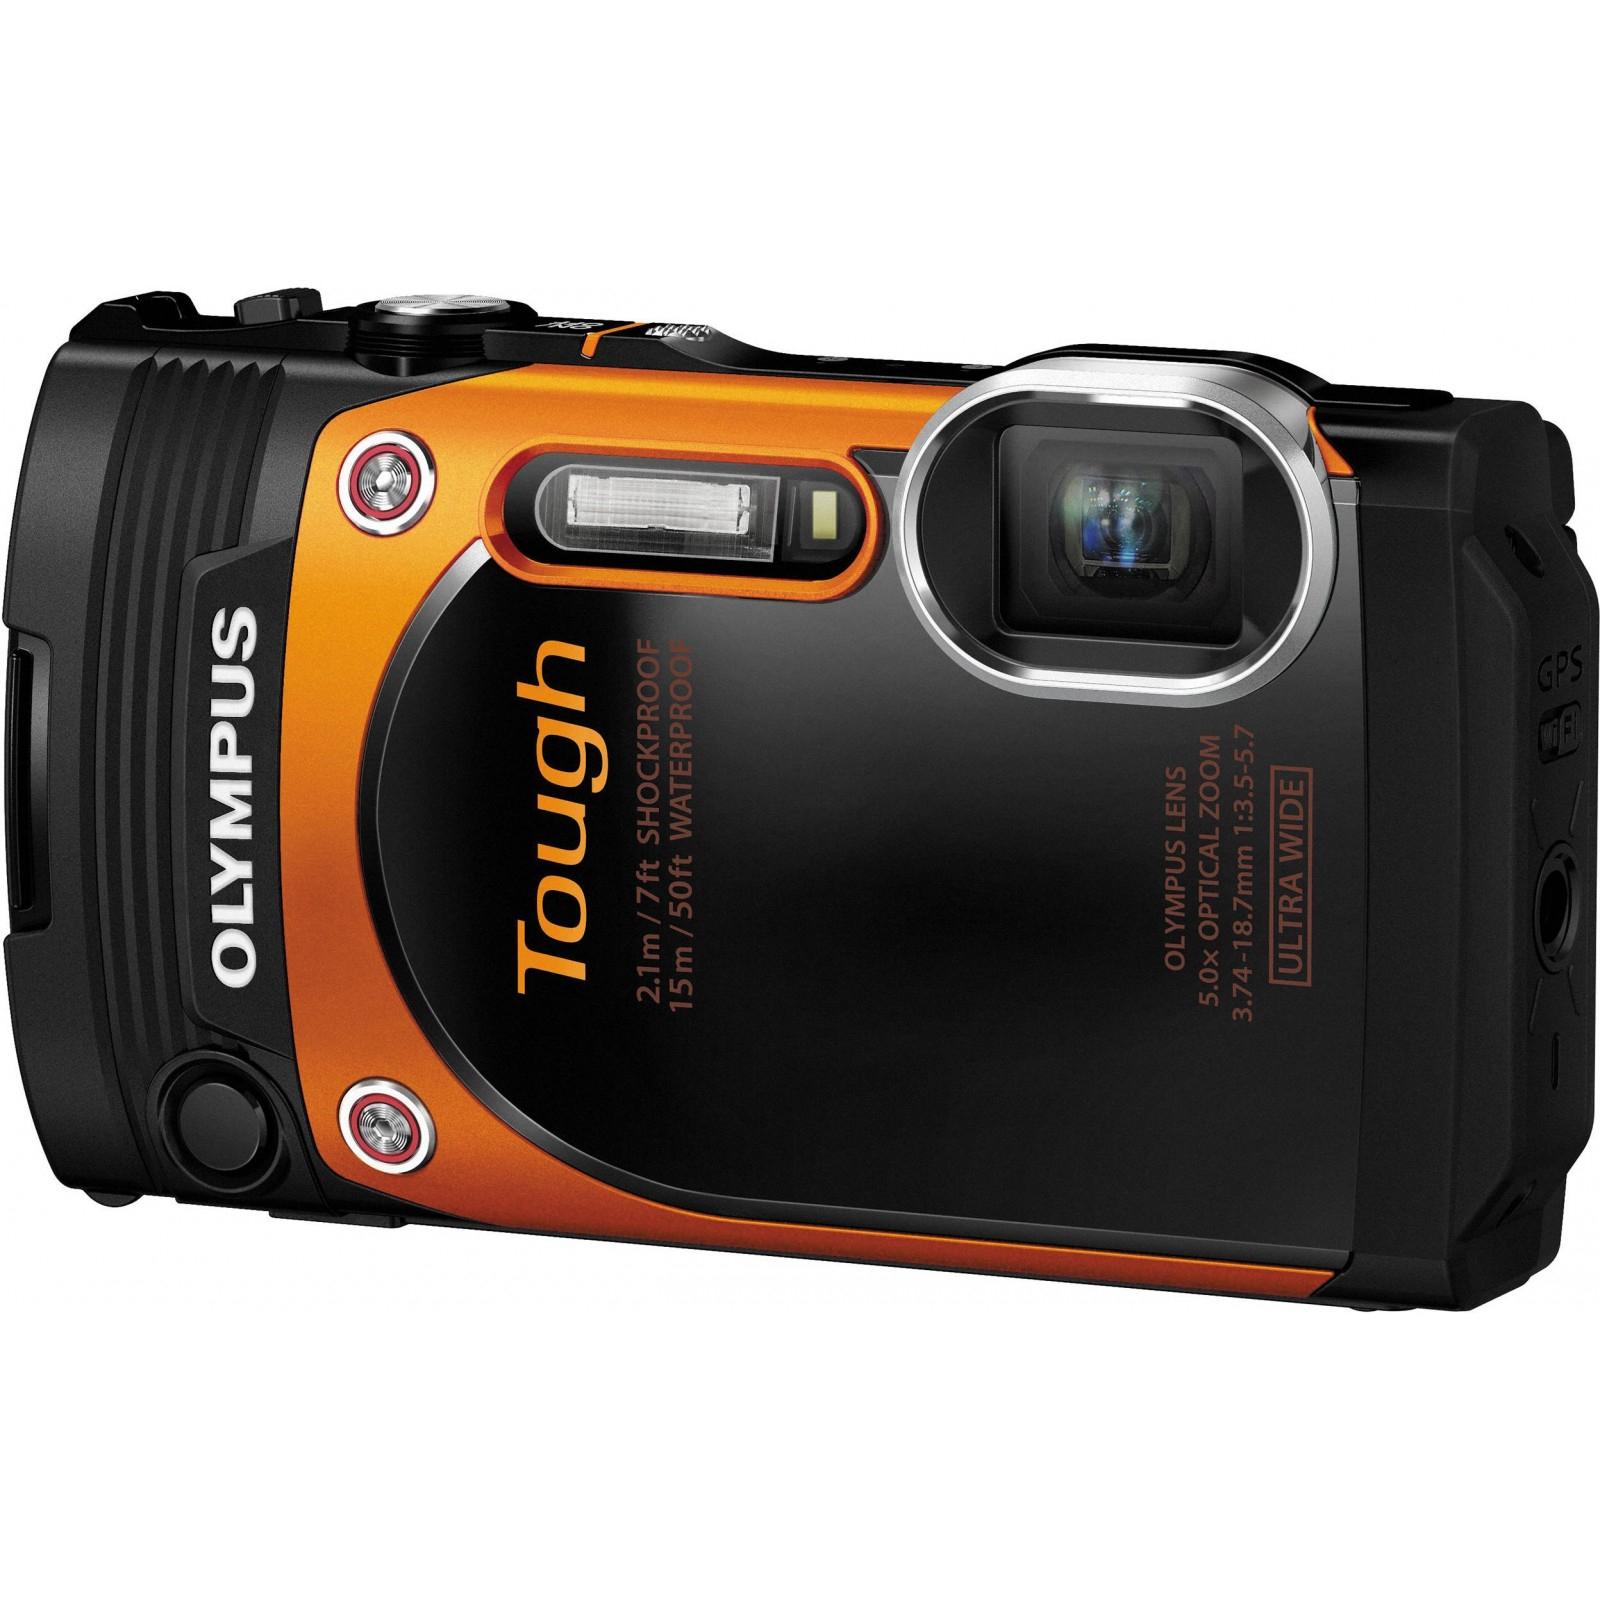 Цифровой фотоаппарат OLYMPUS TG-860 Orange (Waterproof - 15m; iHS; Wi-Fi) (V104170OE000)